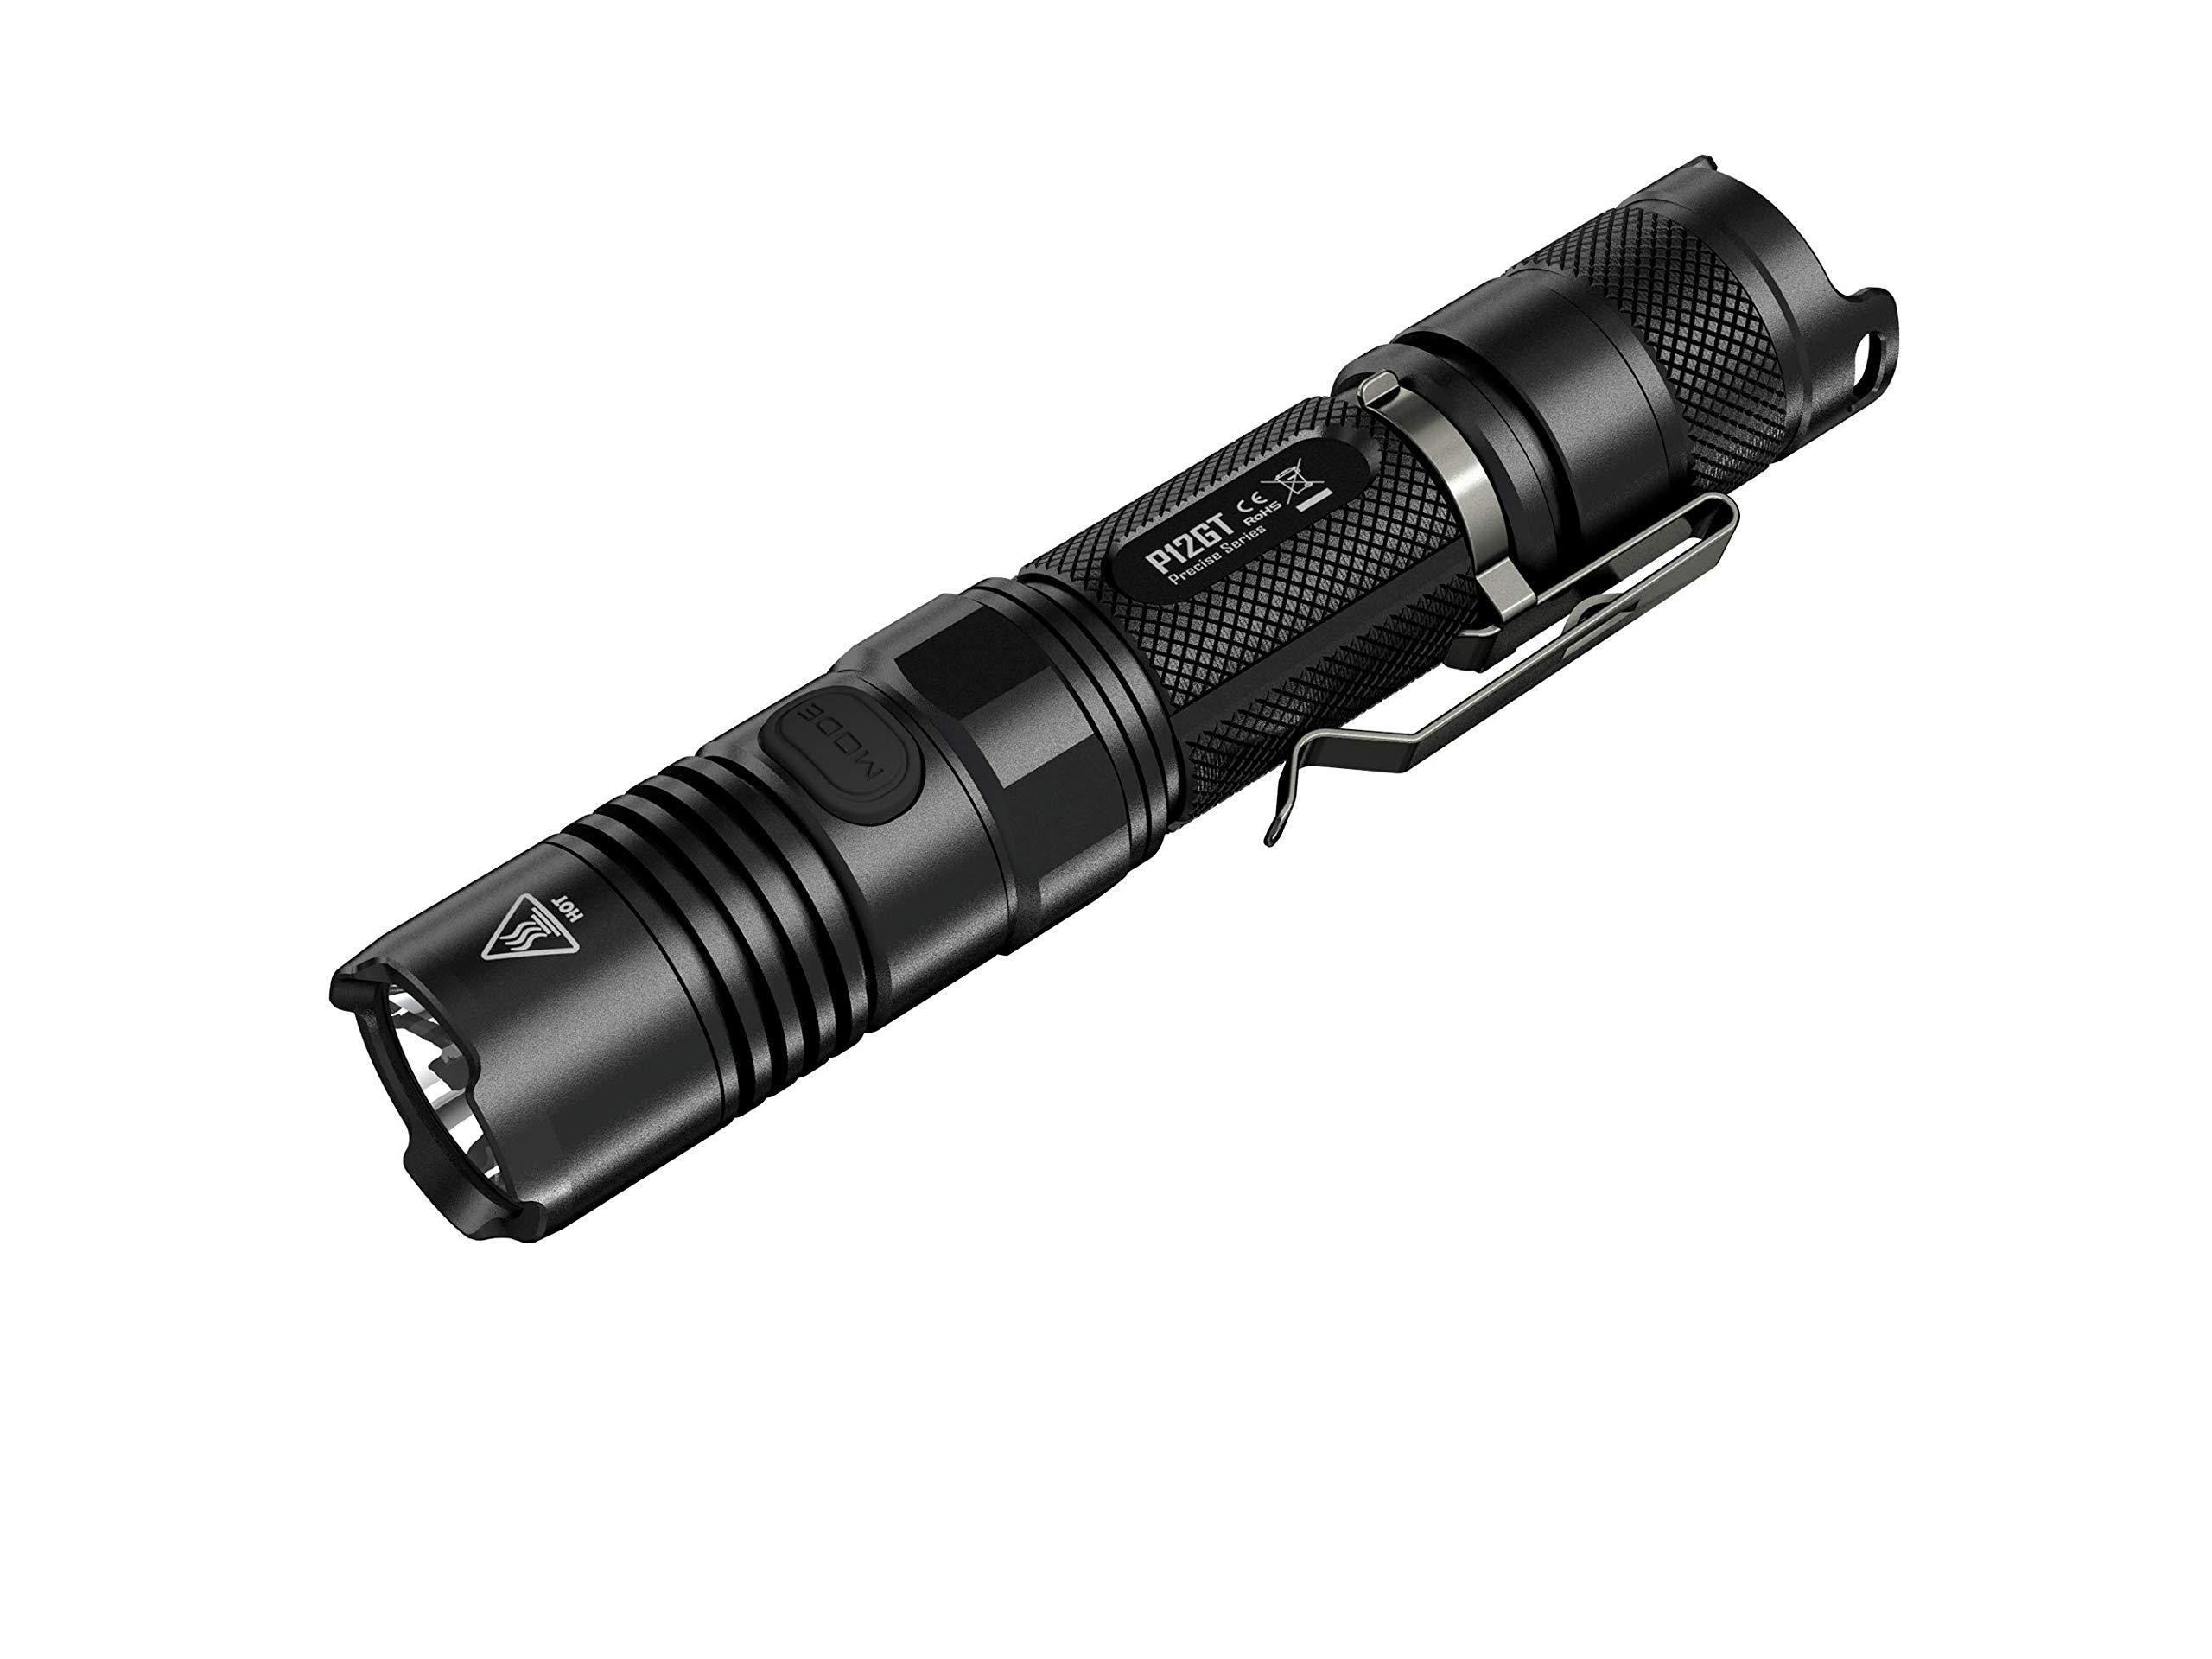 Linternas : Nitecore Precise P12GT 1000 lm Flashlight